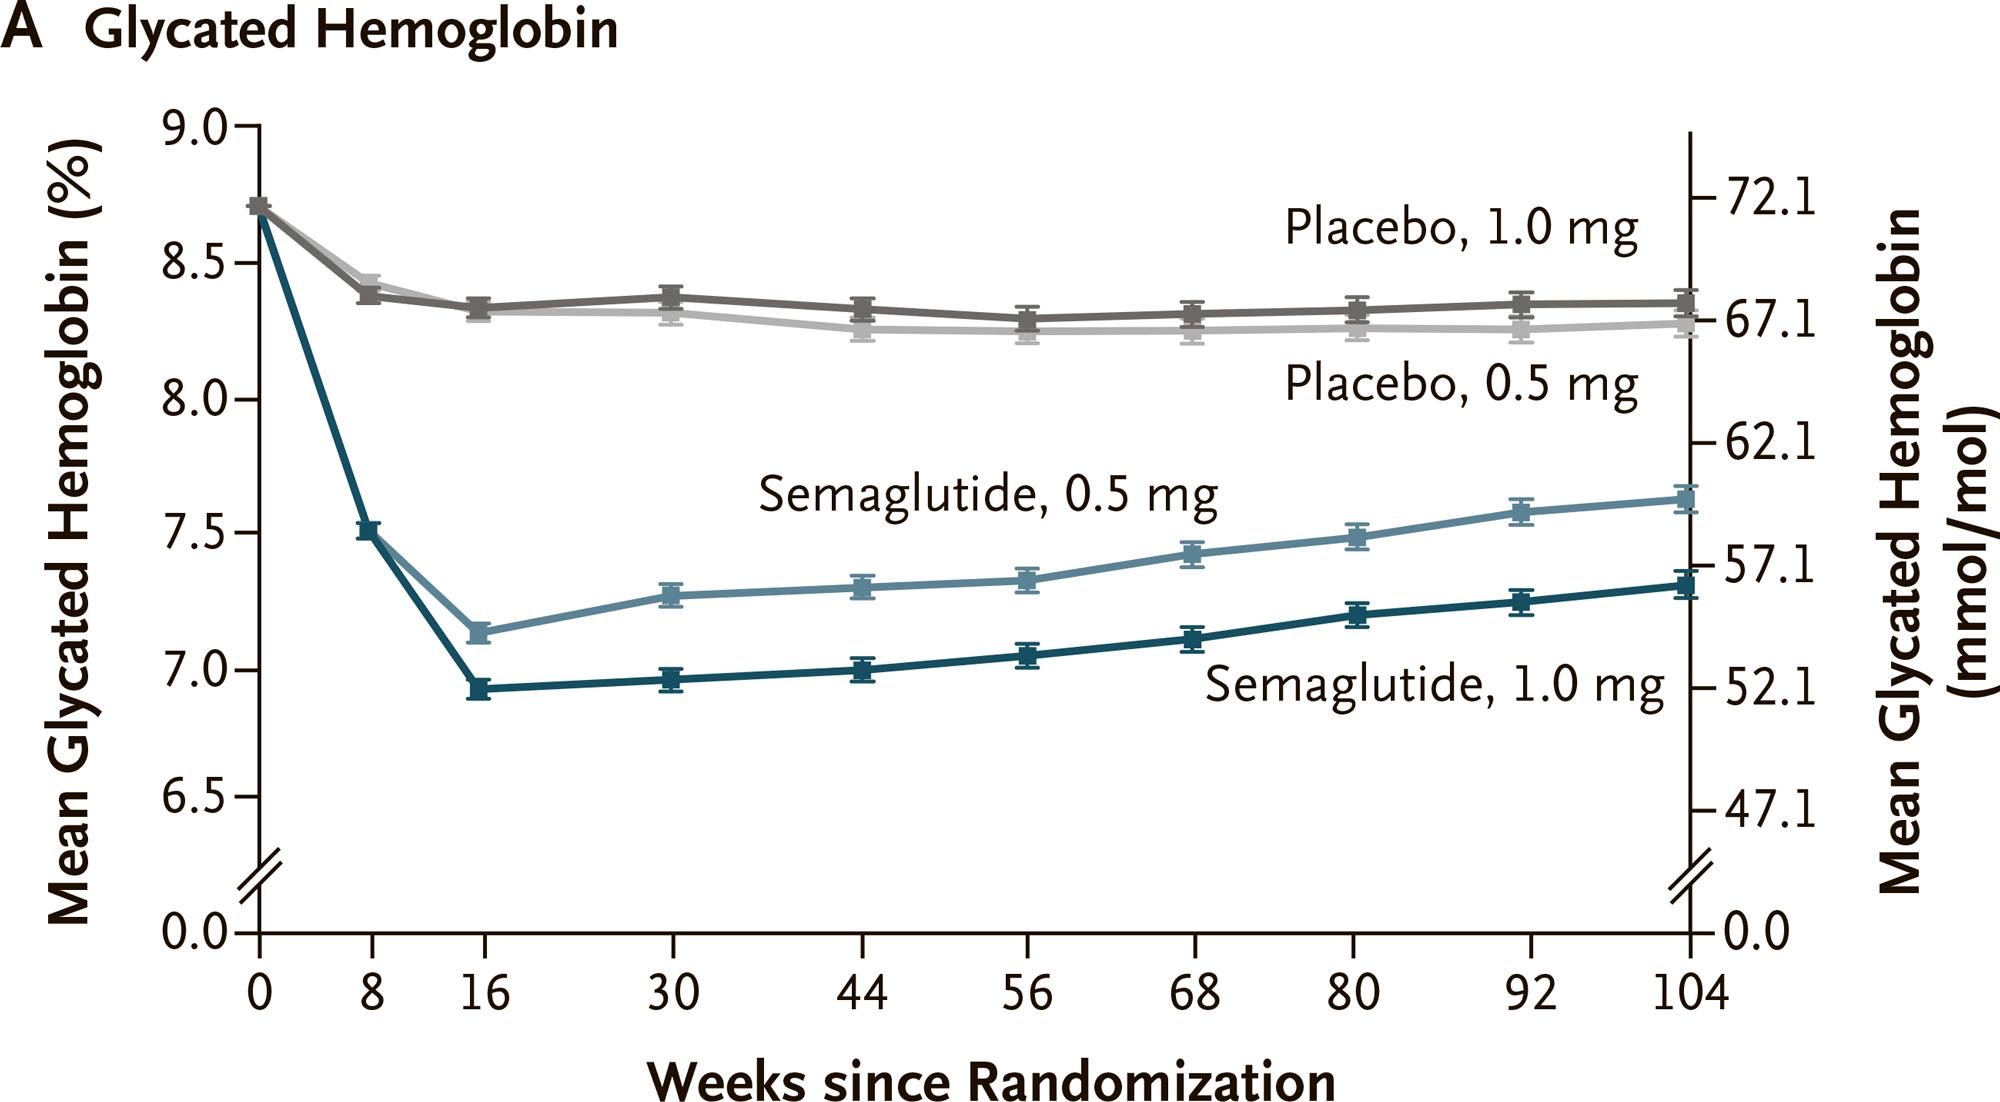 nct01720446 results 06 - Семаглутид спасет сердце диабетиков